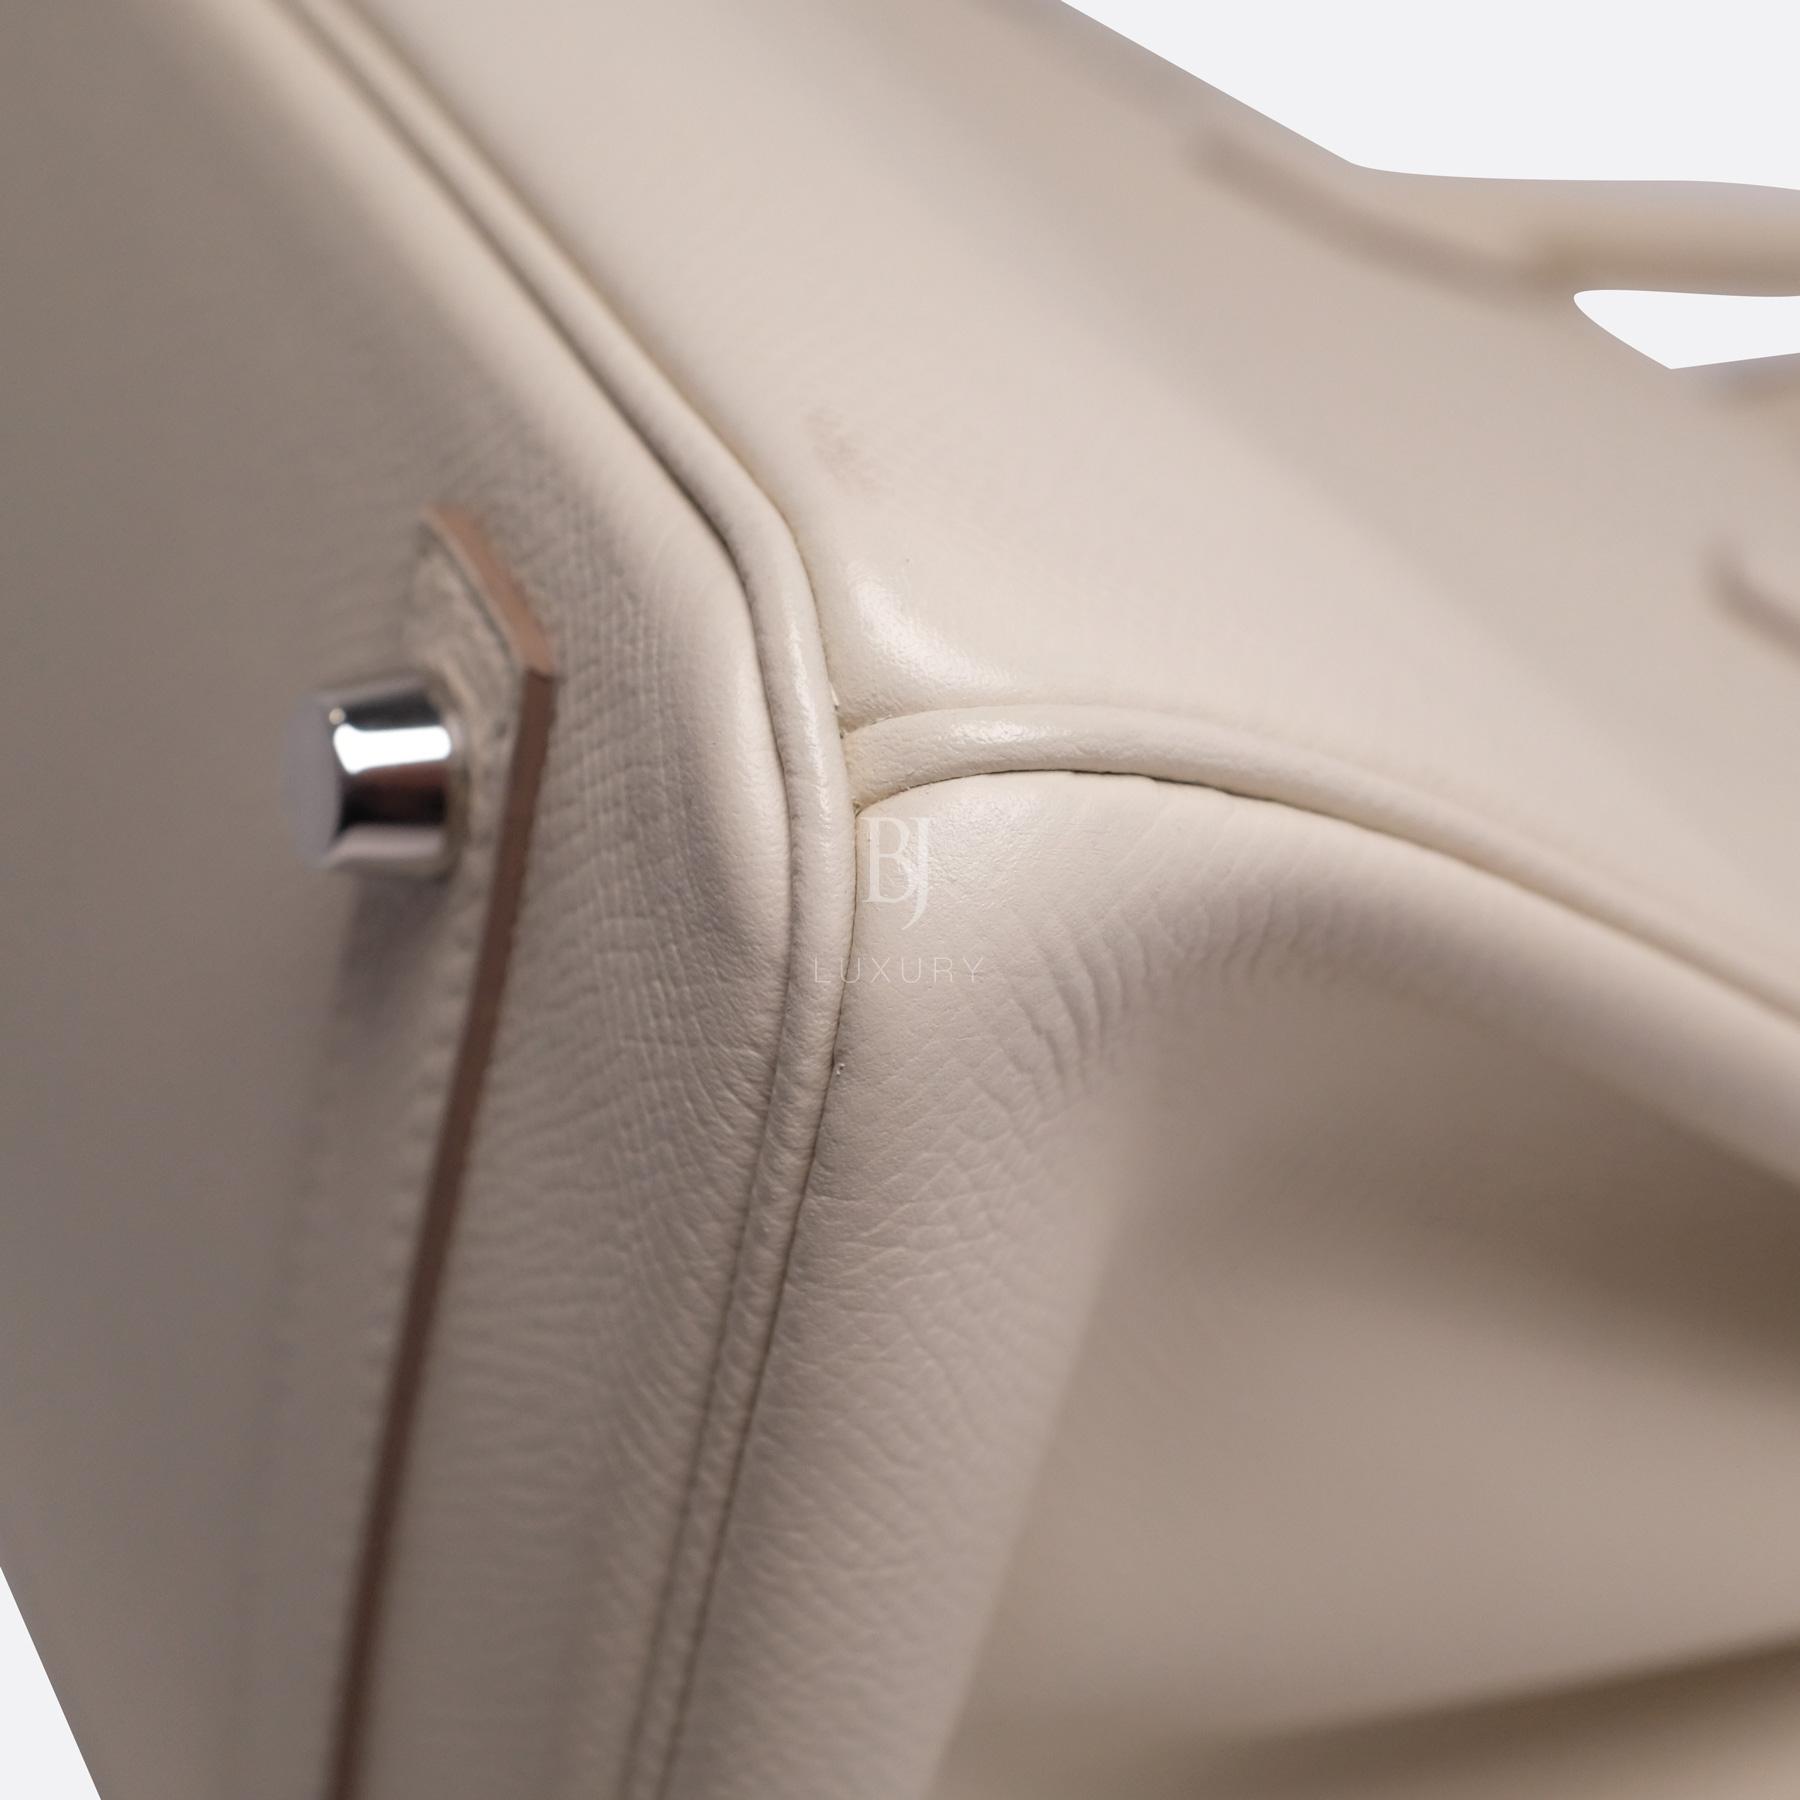 Hermes Birkin 30 Epsom Craie Palladium BJ Luxury 15.jpg